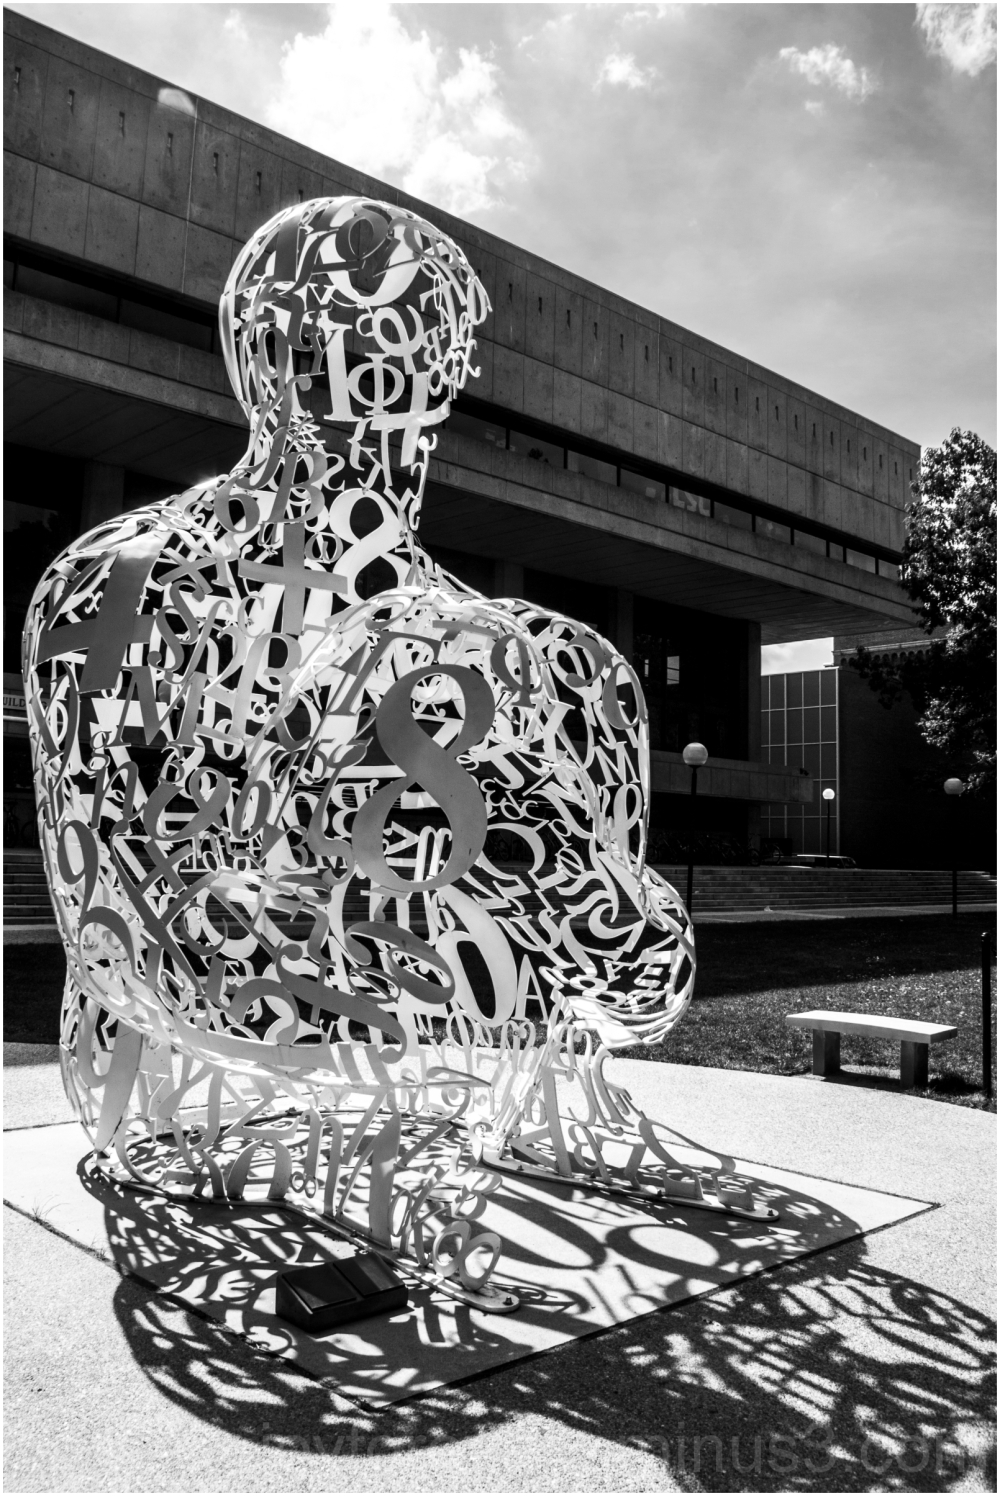 MIT Cambridge Alchemist sculpture numbers art